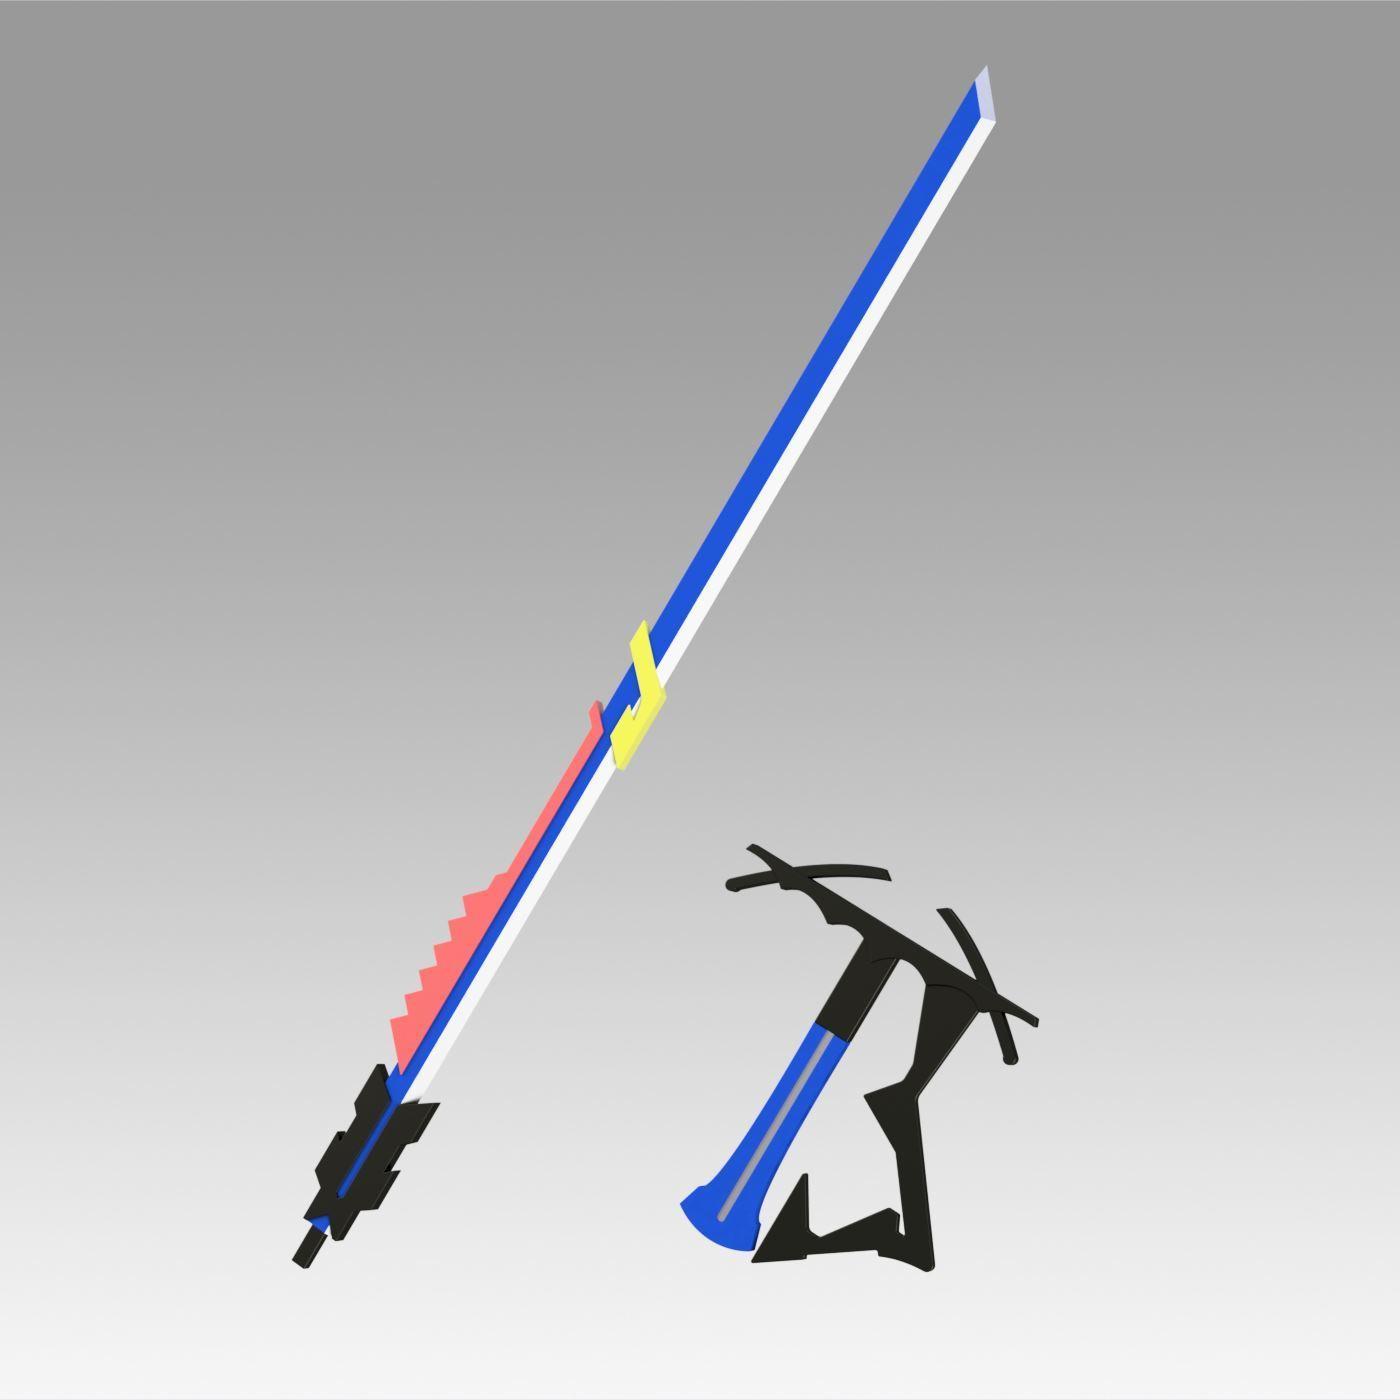 10.jpg Download OBJ file Arknights Astesia Epoque Sword Cosplay Weapon Prop  • 3D printable template, Blackeveryday